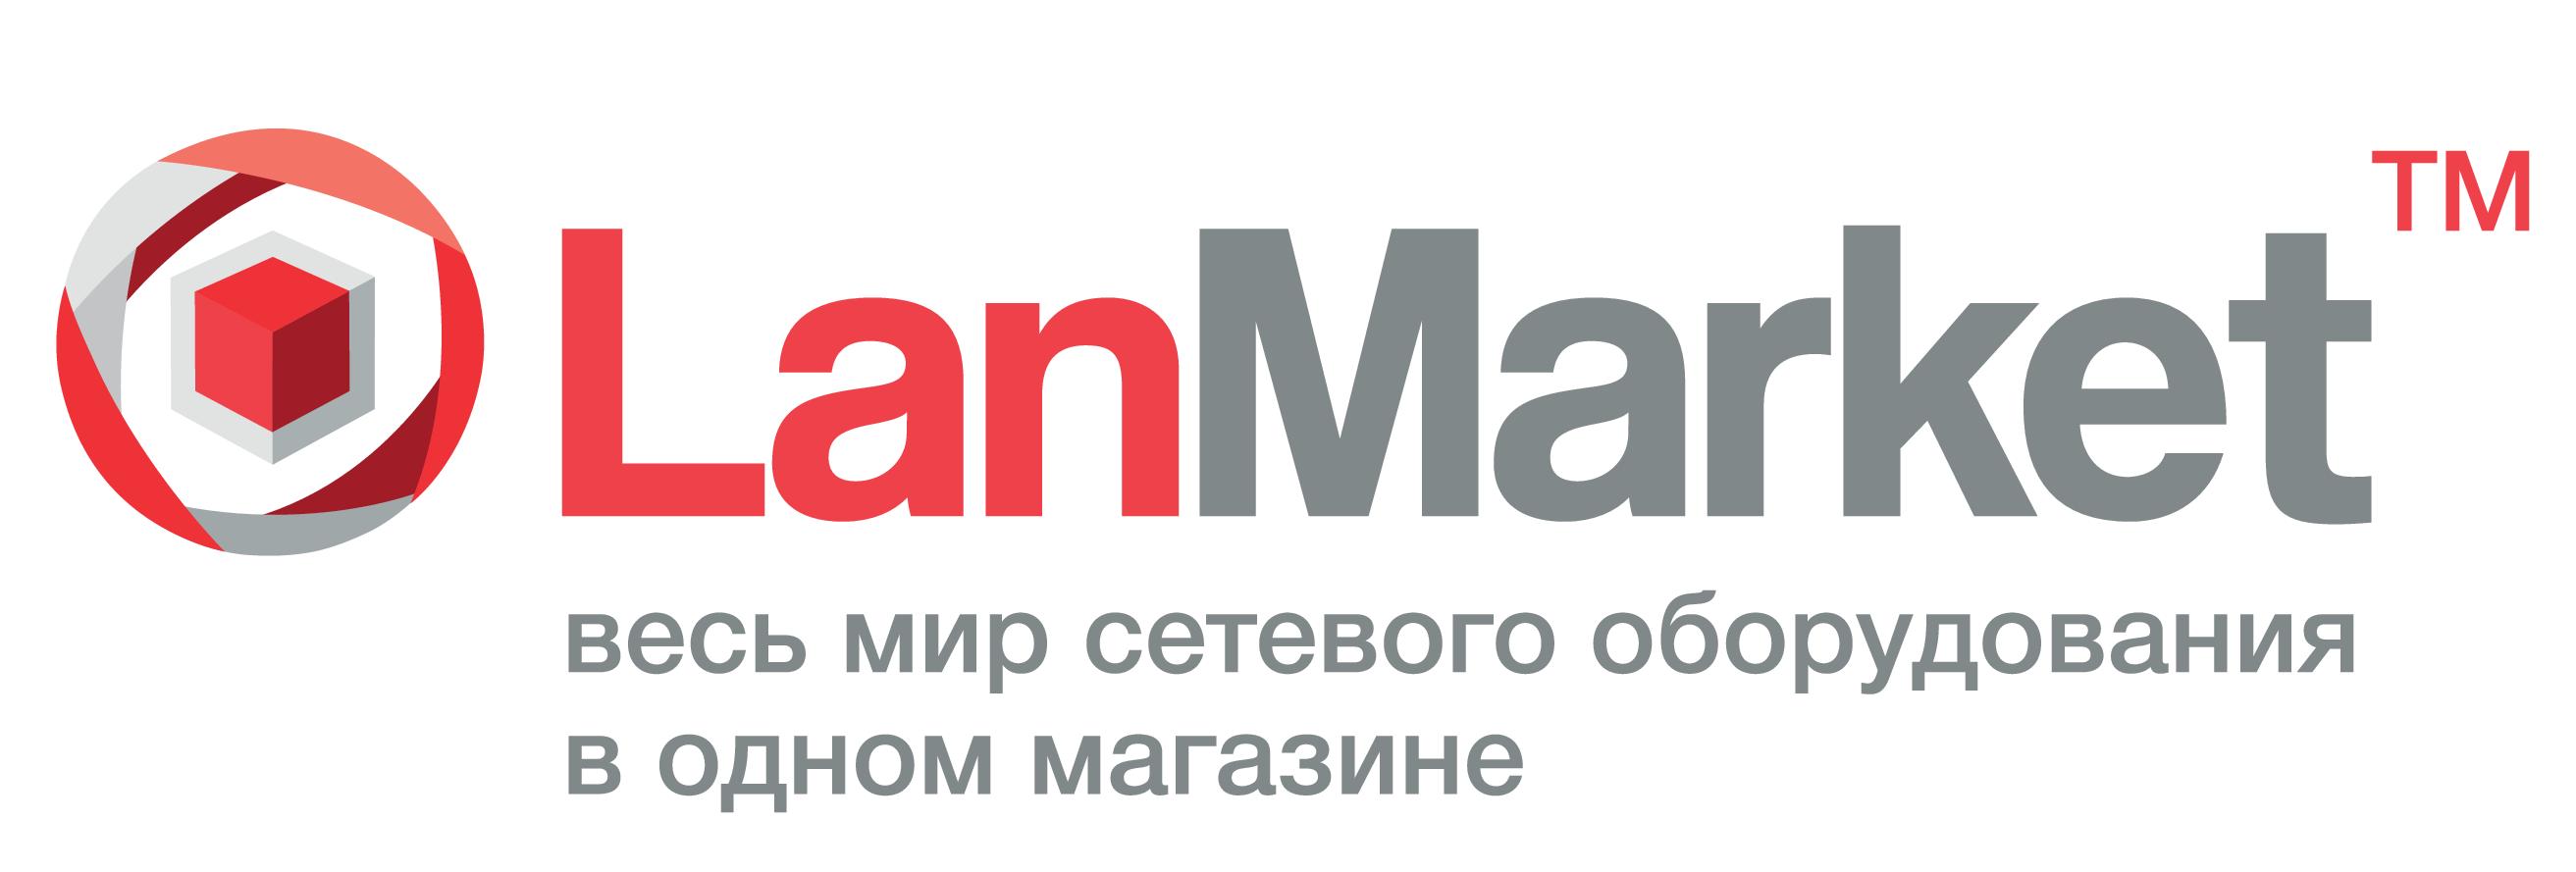 LanMarket_logo_final